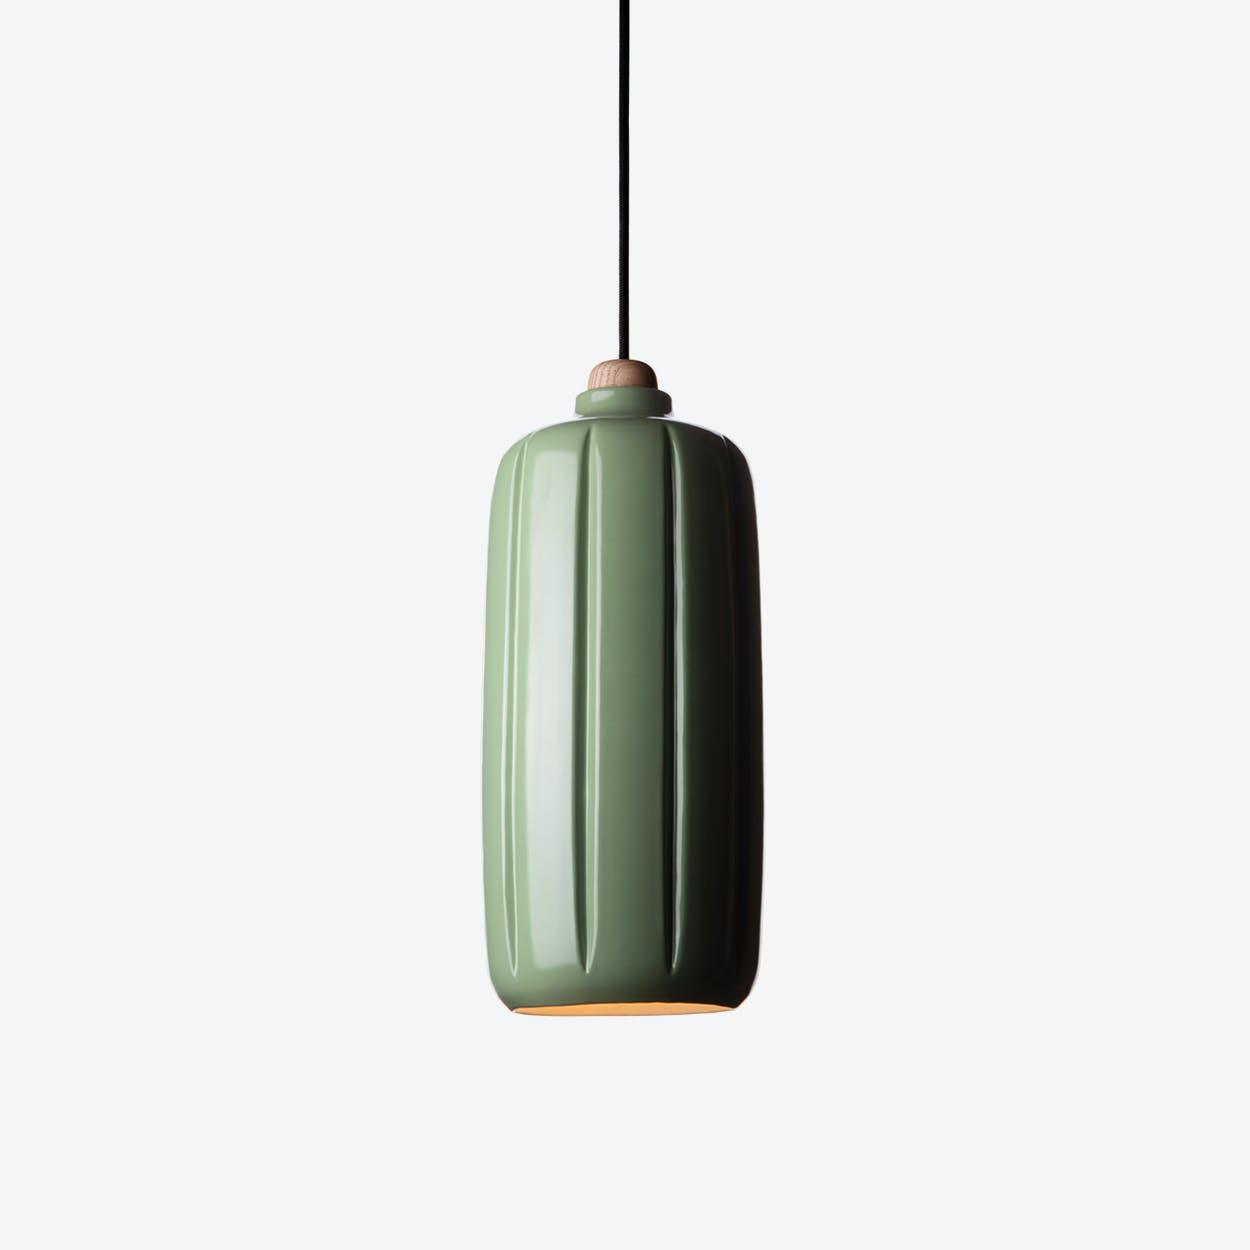 Cosse Large Pendant Lamp in Green